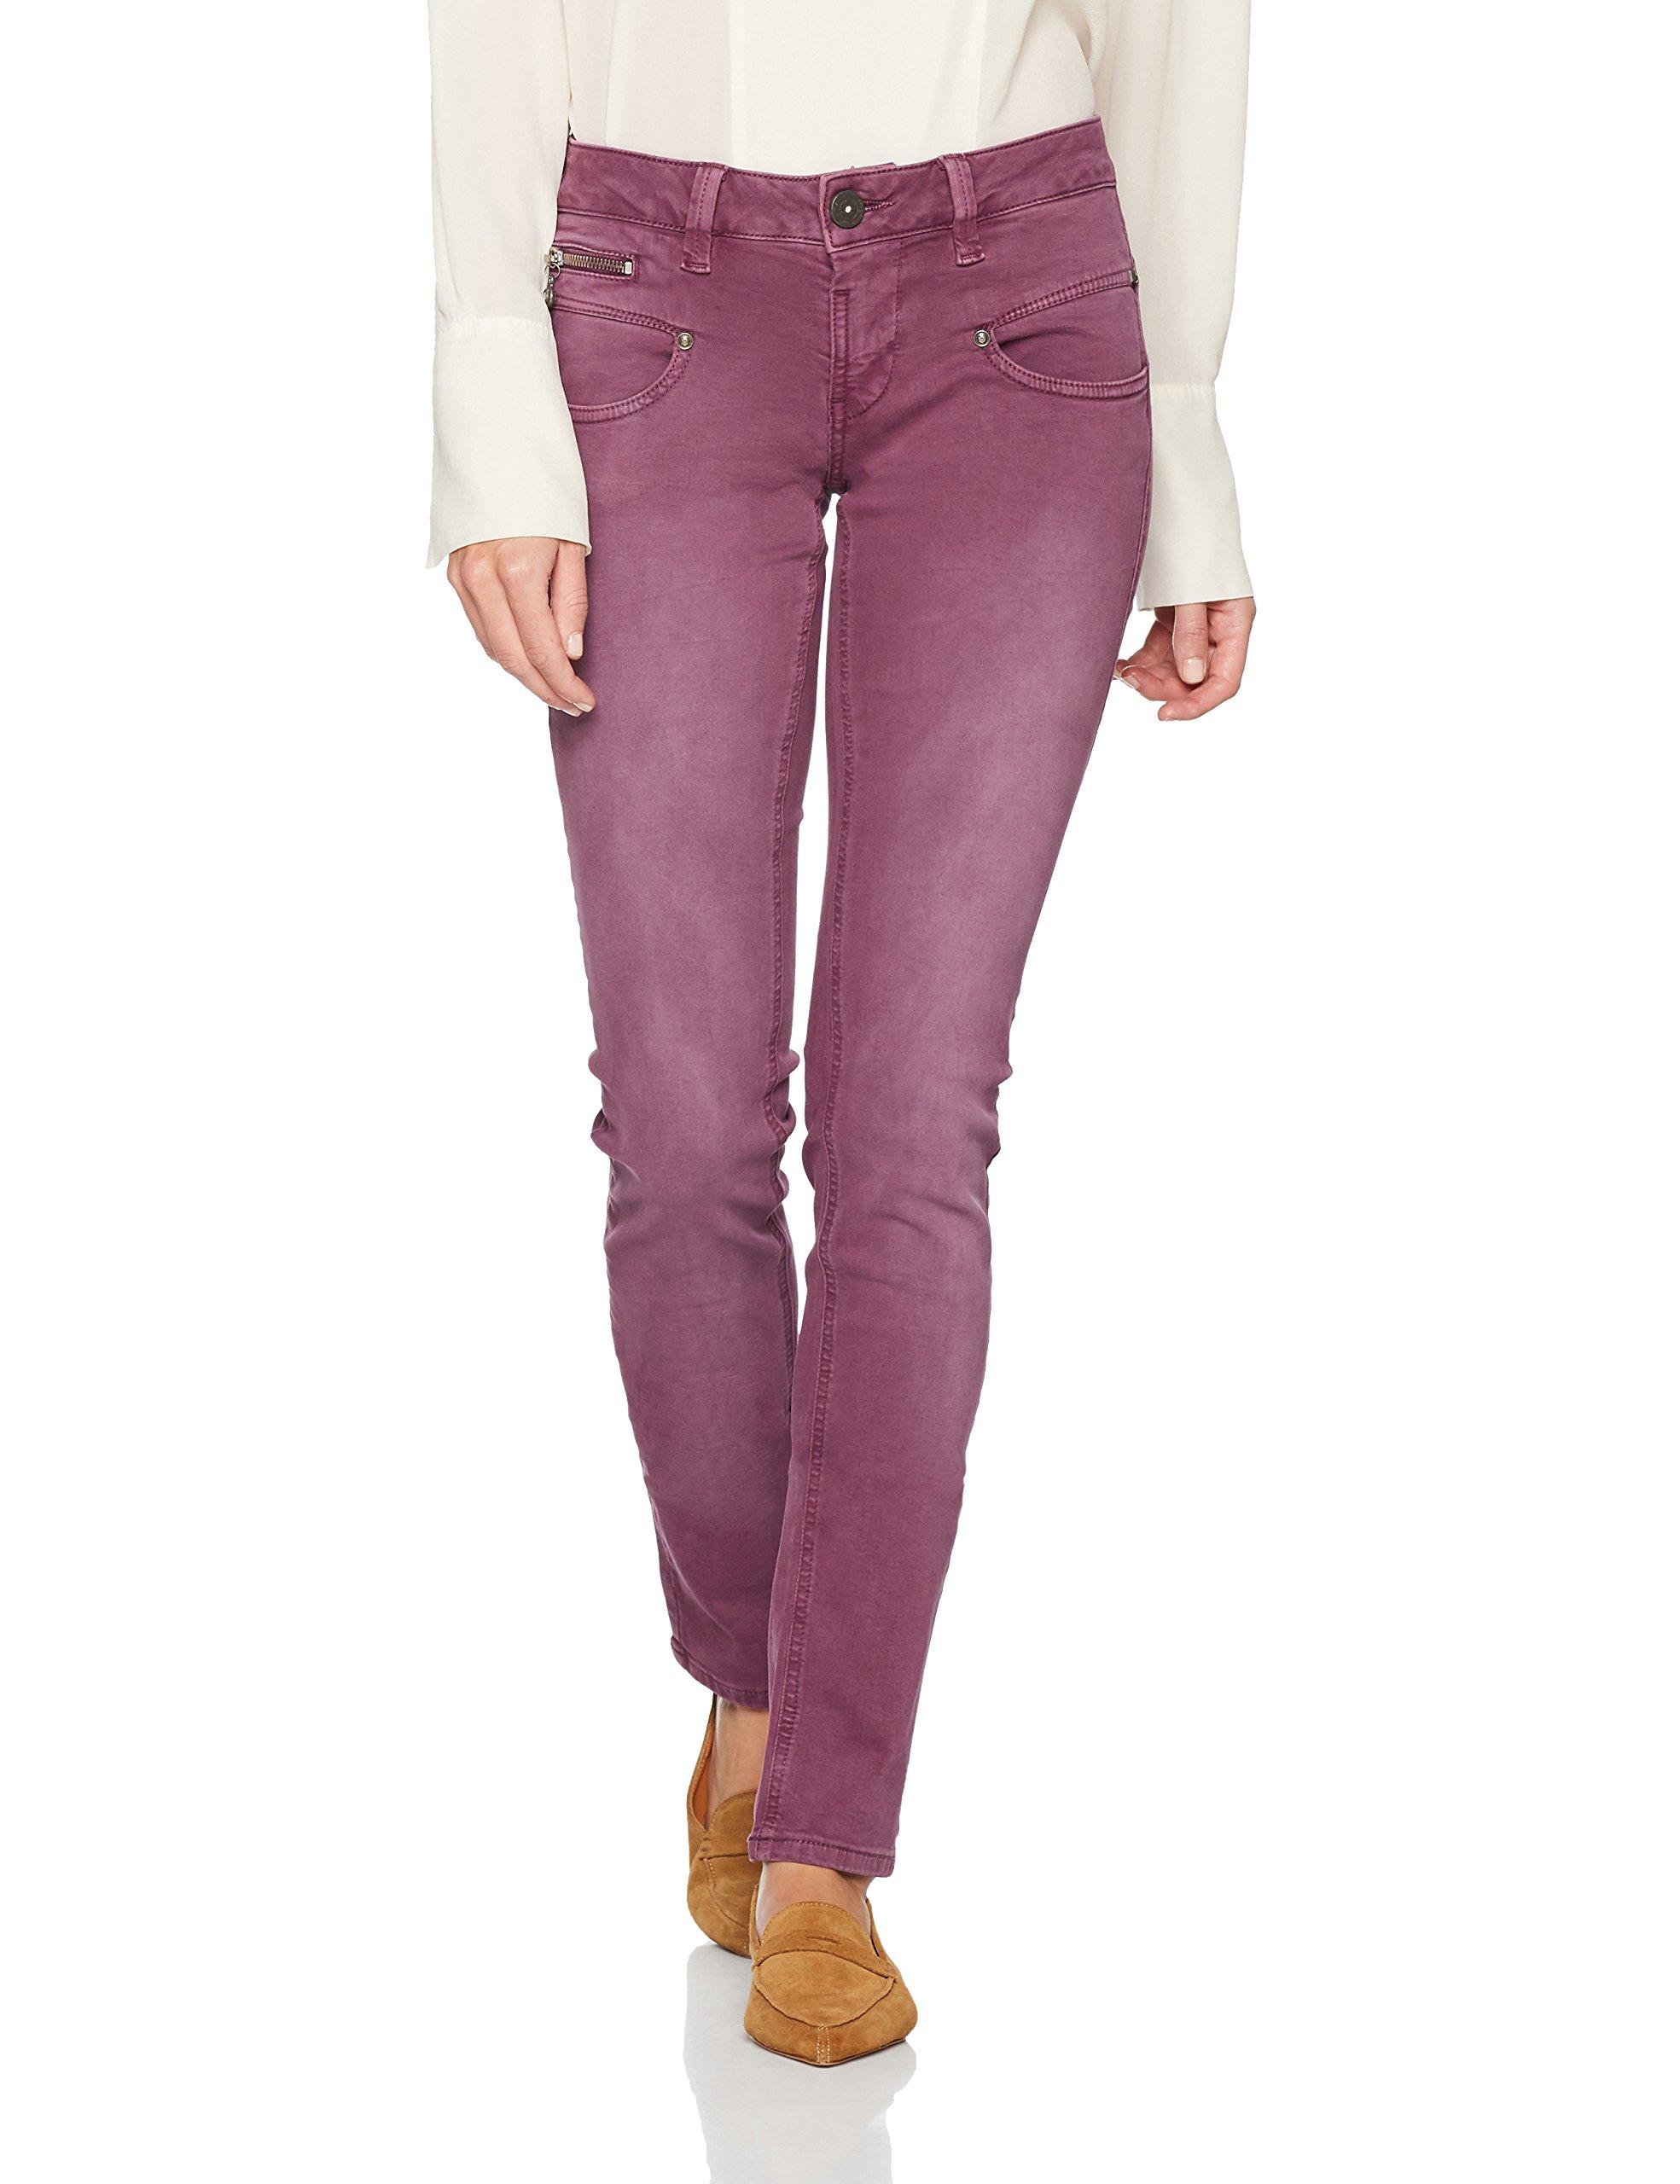 T Femme Freeman Color Porter New F486W30 Slim Alexa Magic PantalonVioletpotent Purple UMVqSpGz